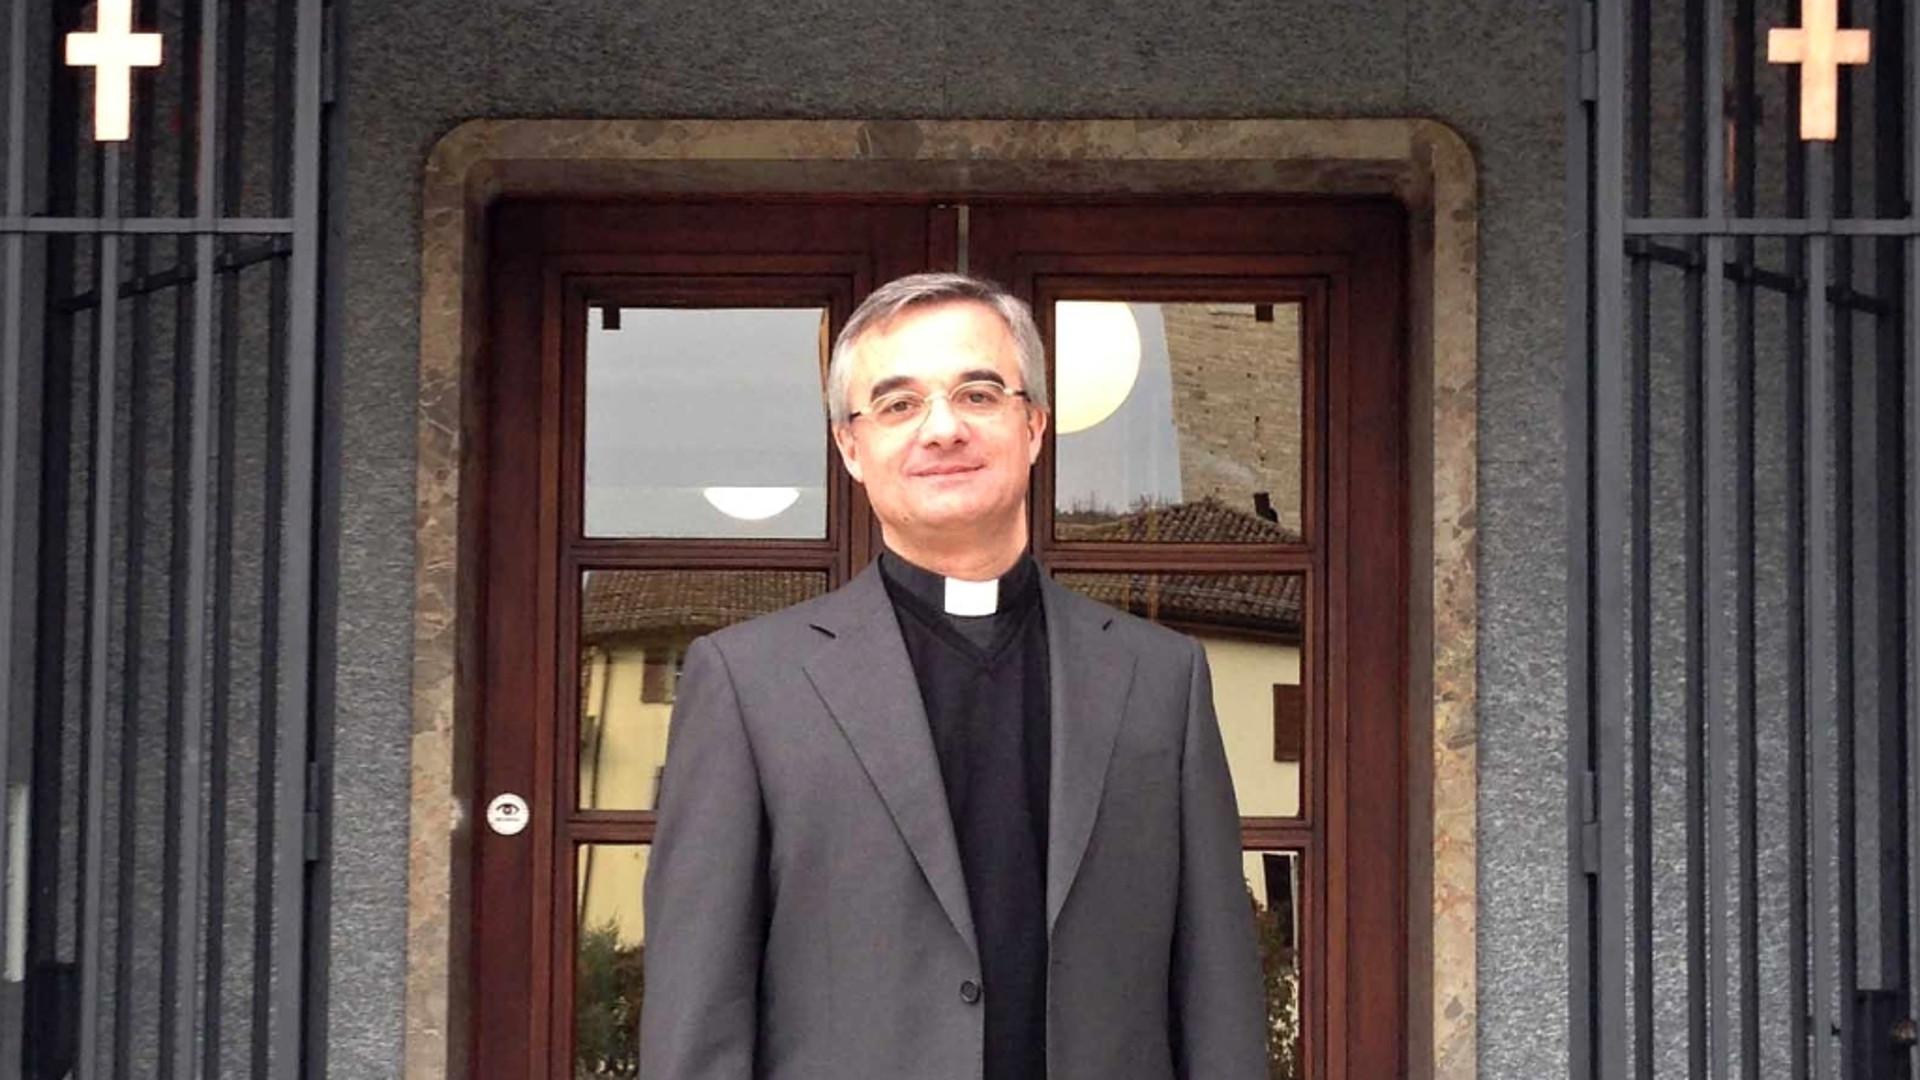 Lyons Bischfe gegen Tod fr Koma-Patienten - kathnet